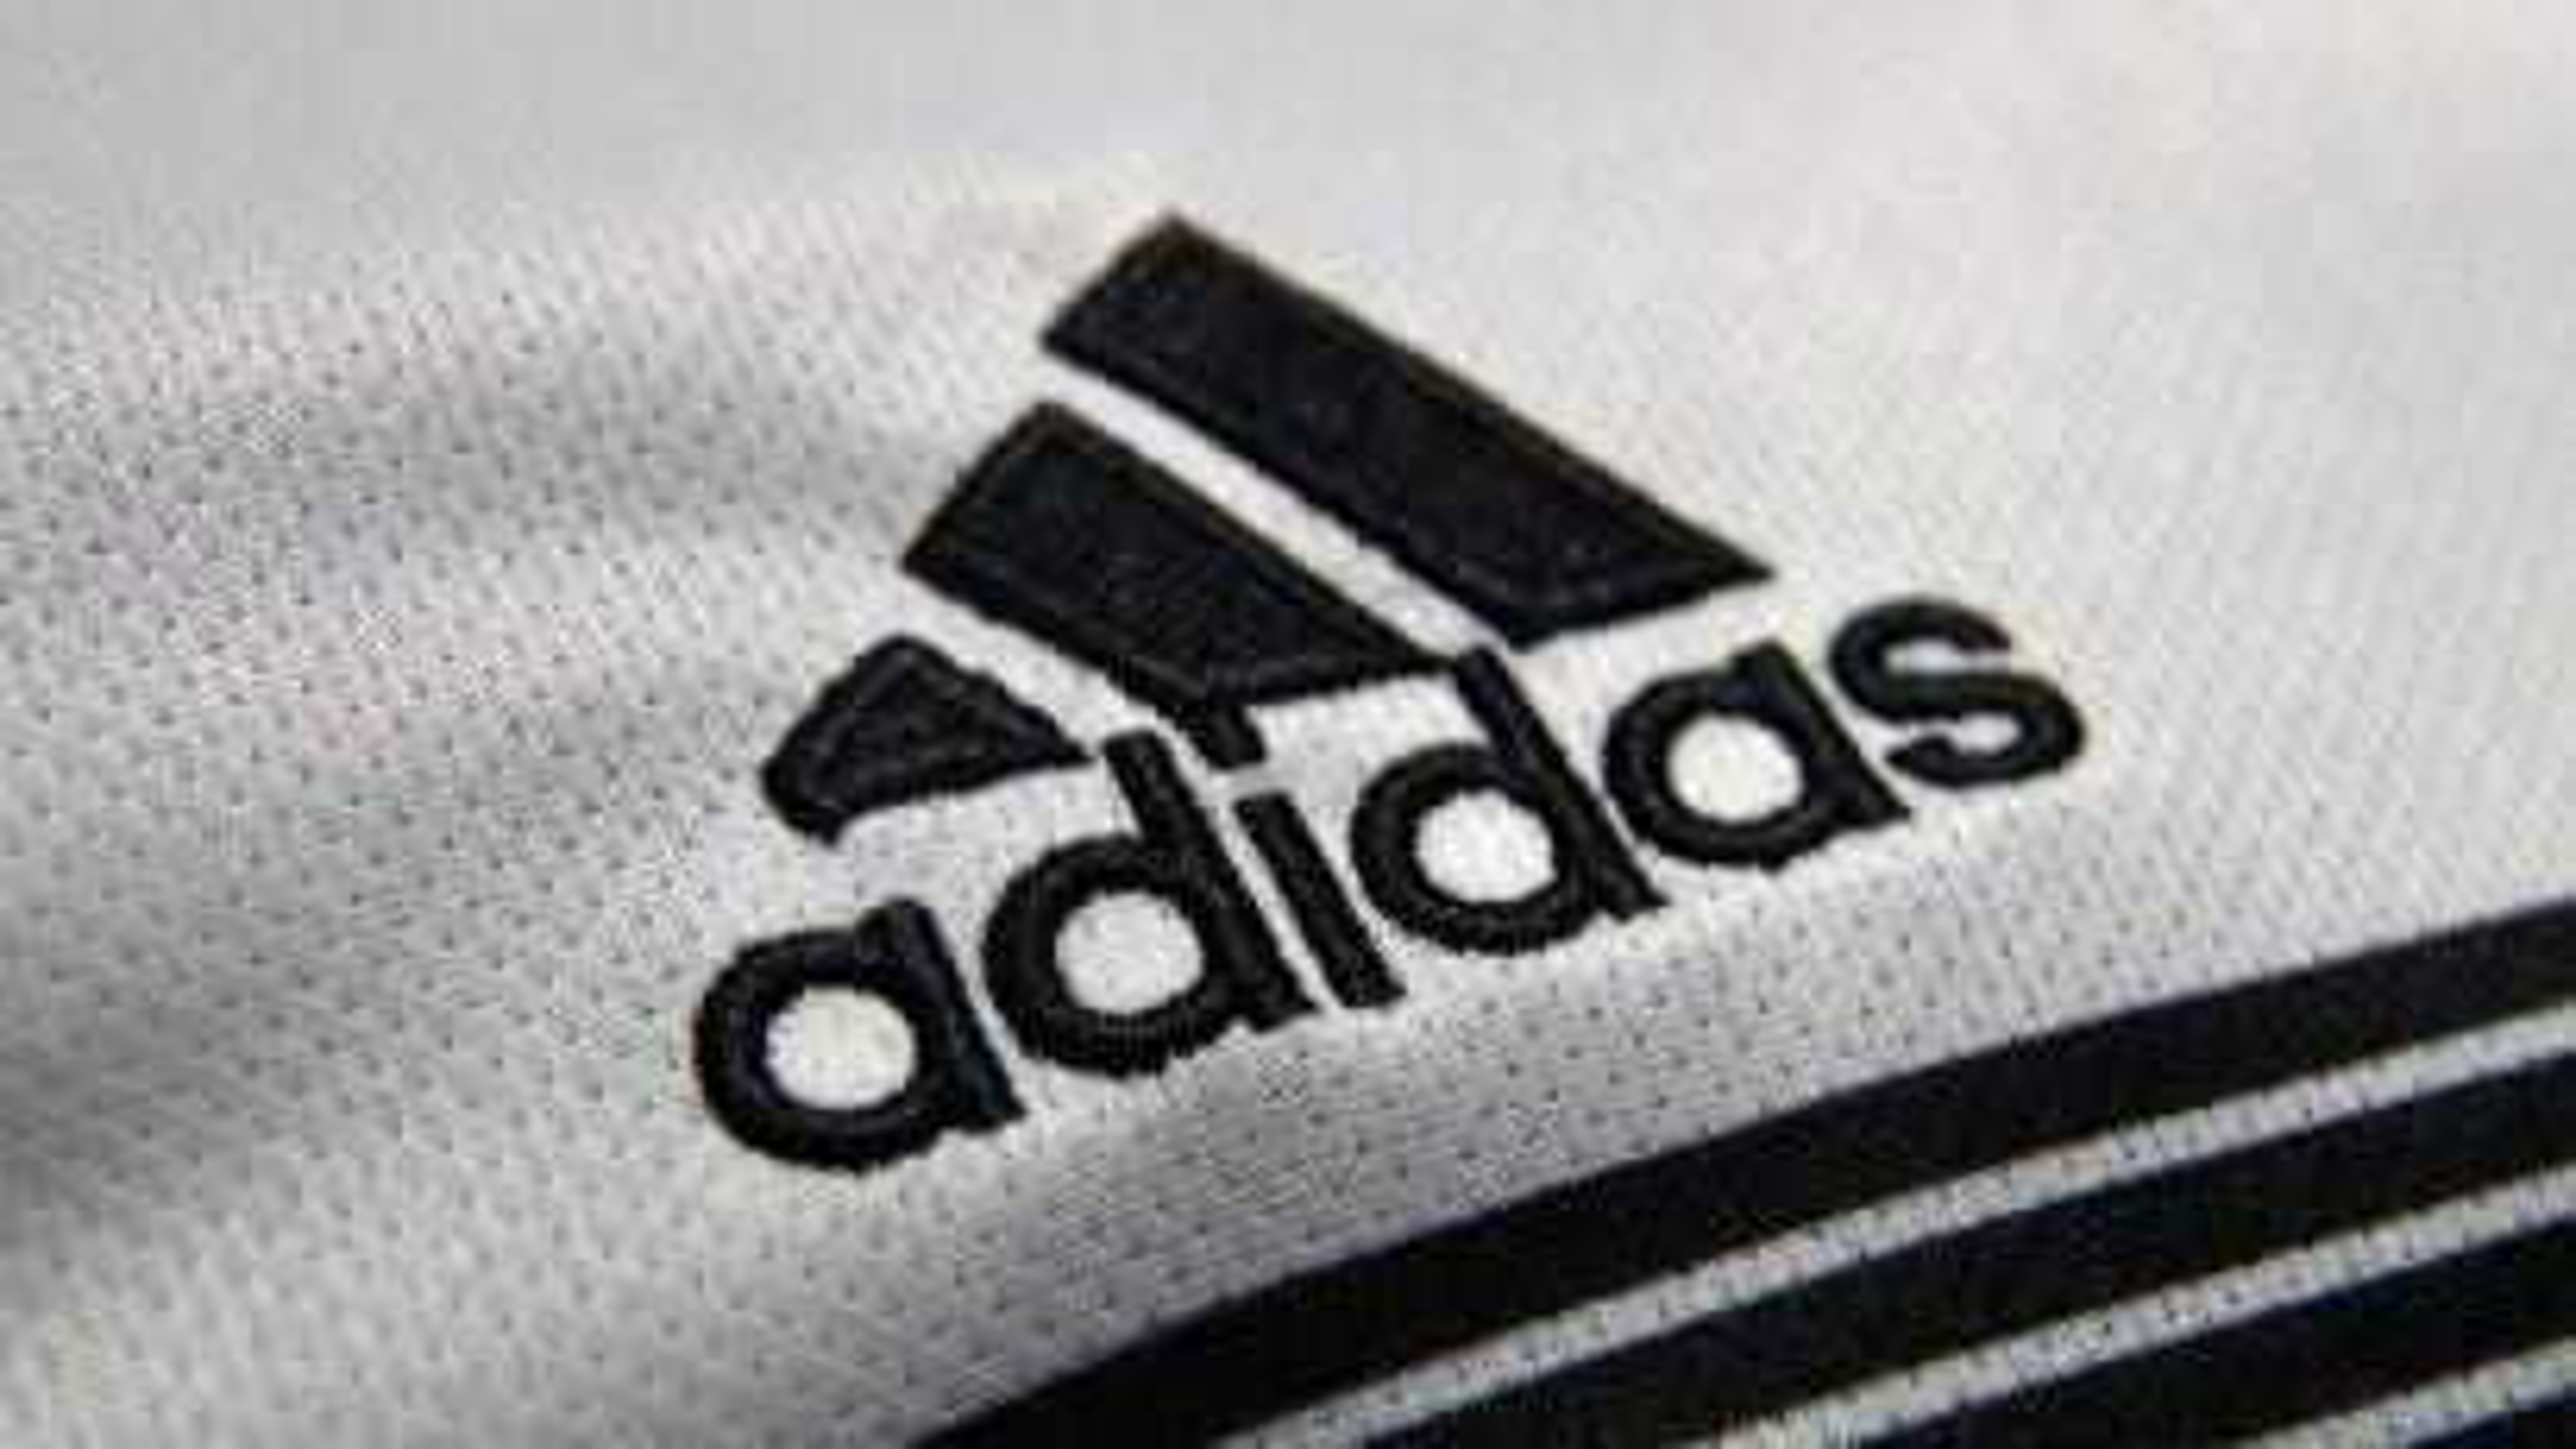 The Adidas logo